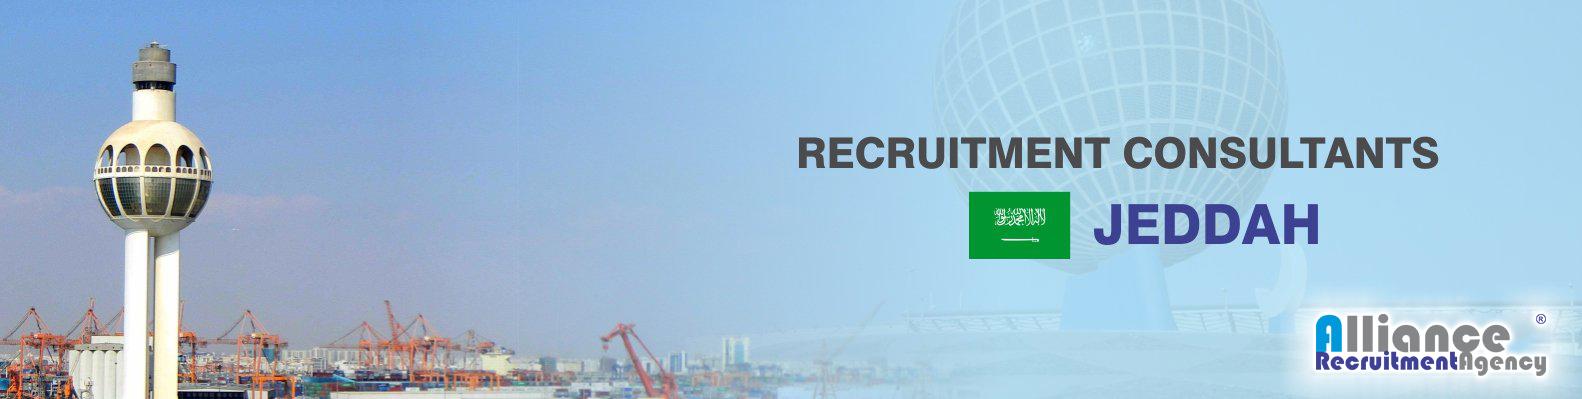 recruitment agency jeddah